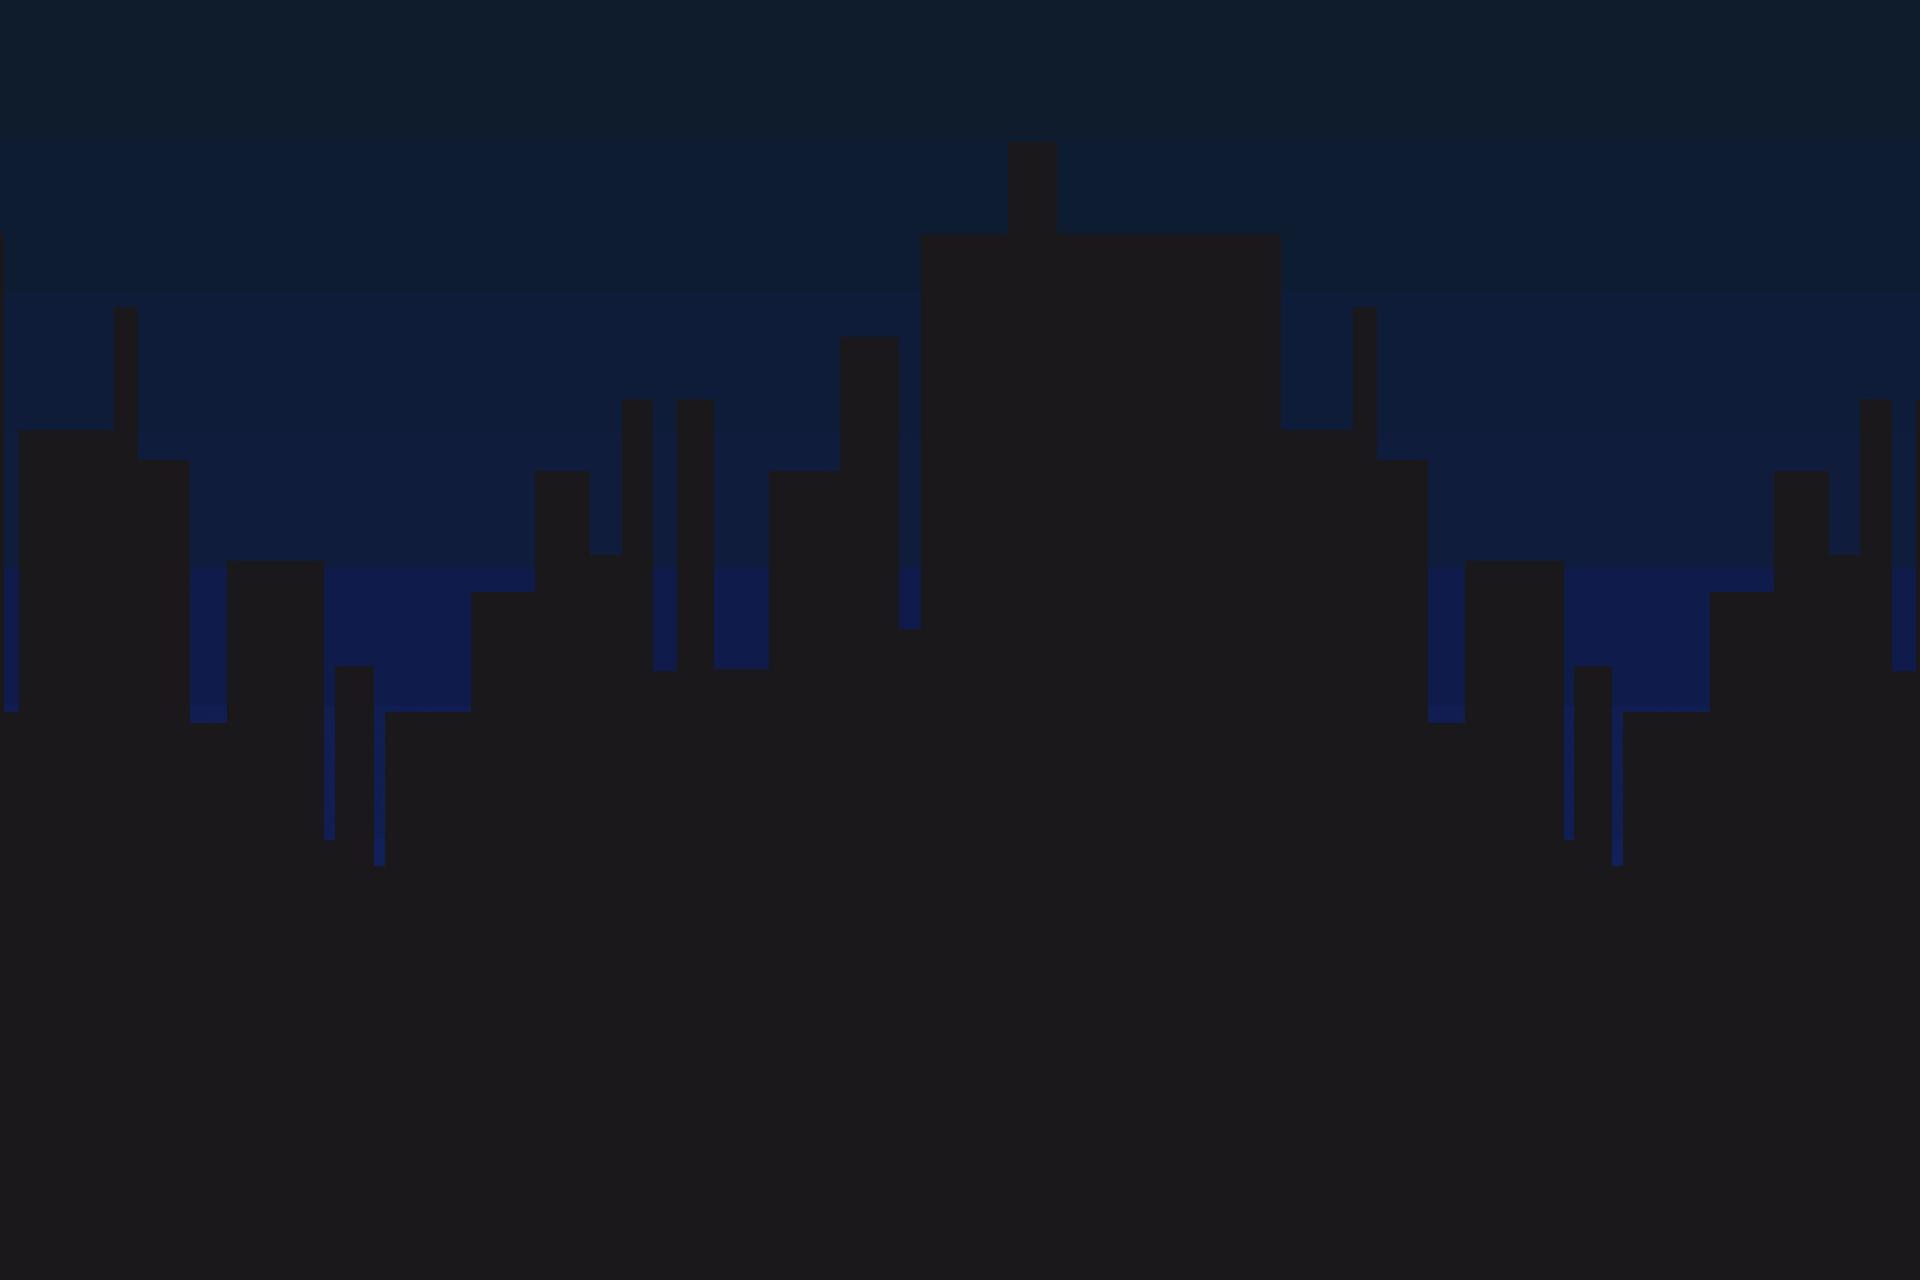 bit city wallpaper background 1920x1280 by nerdboarder d6d0sq2jpg 1920x1280